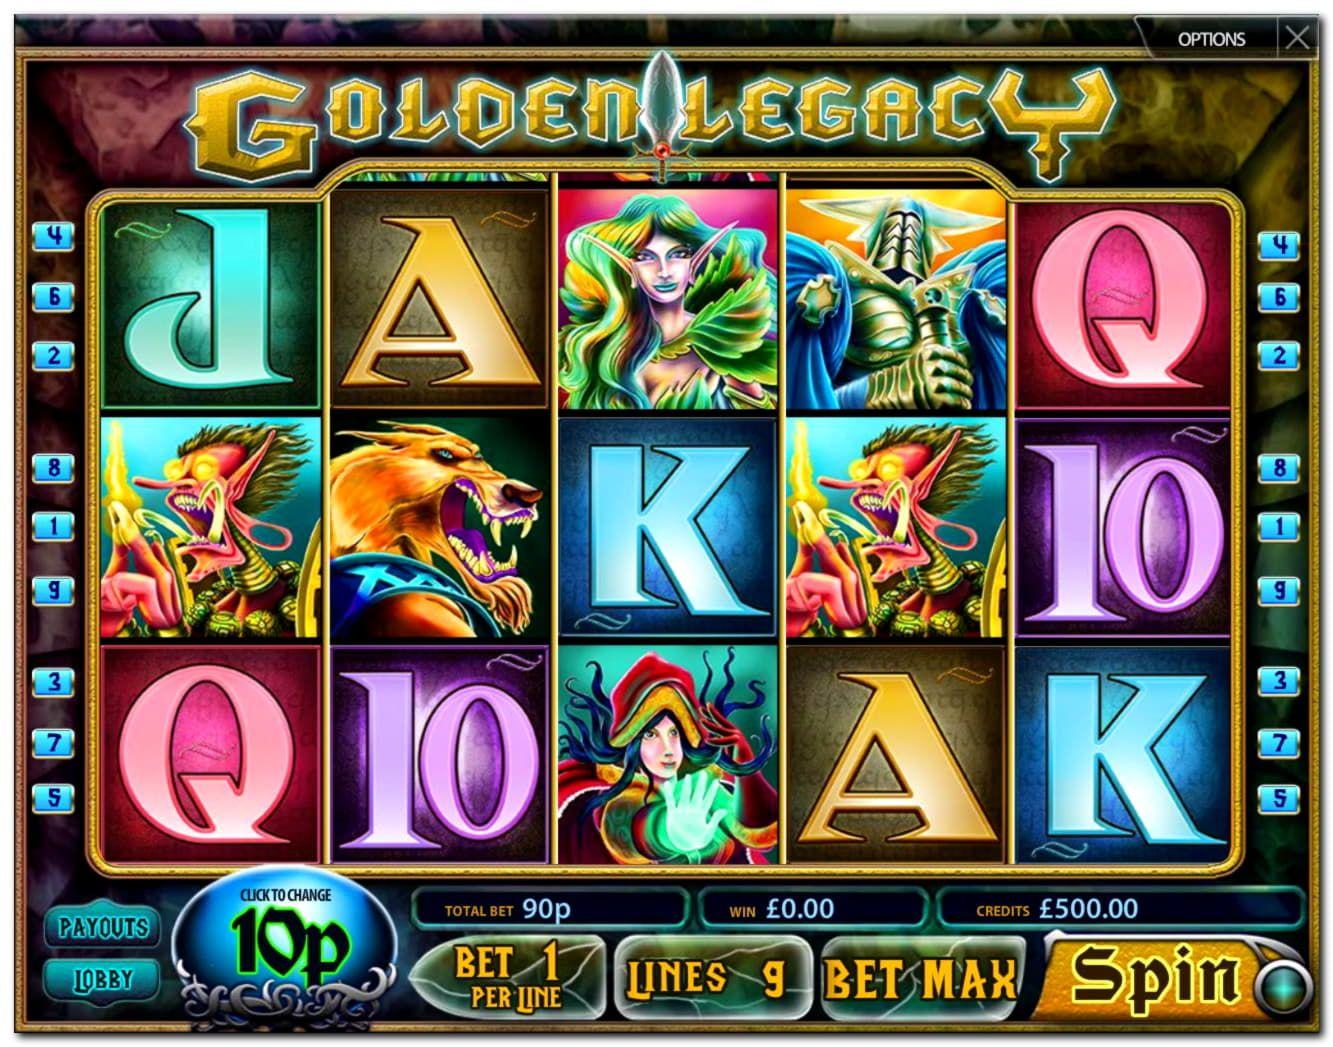 930 deposit match bonus at genesis casino 55x play